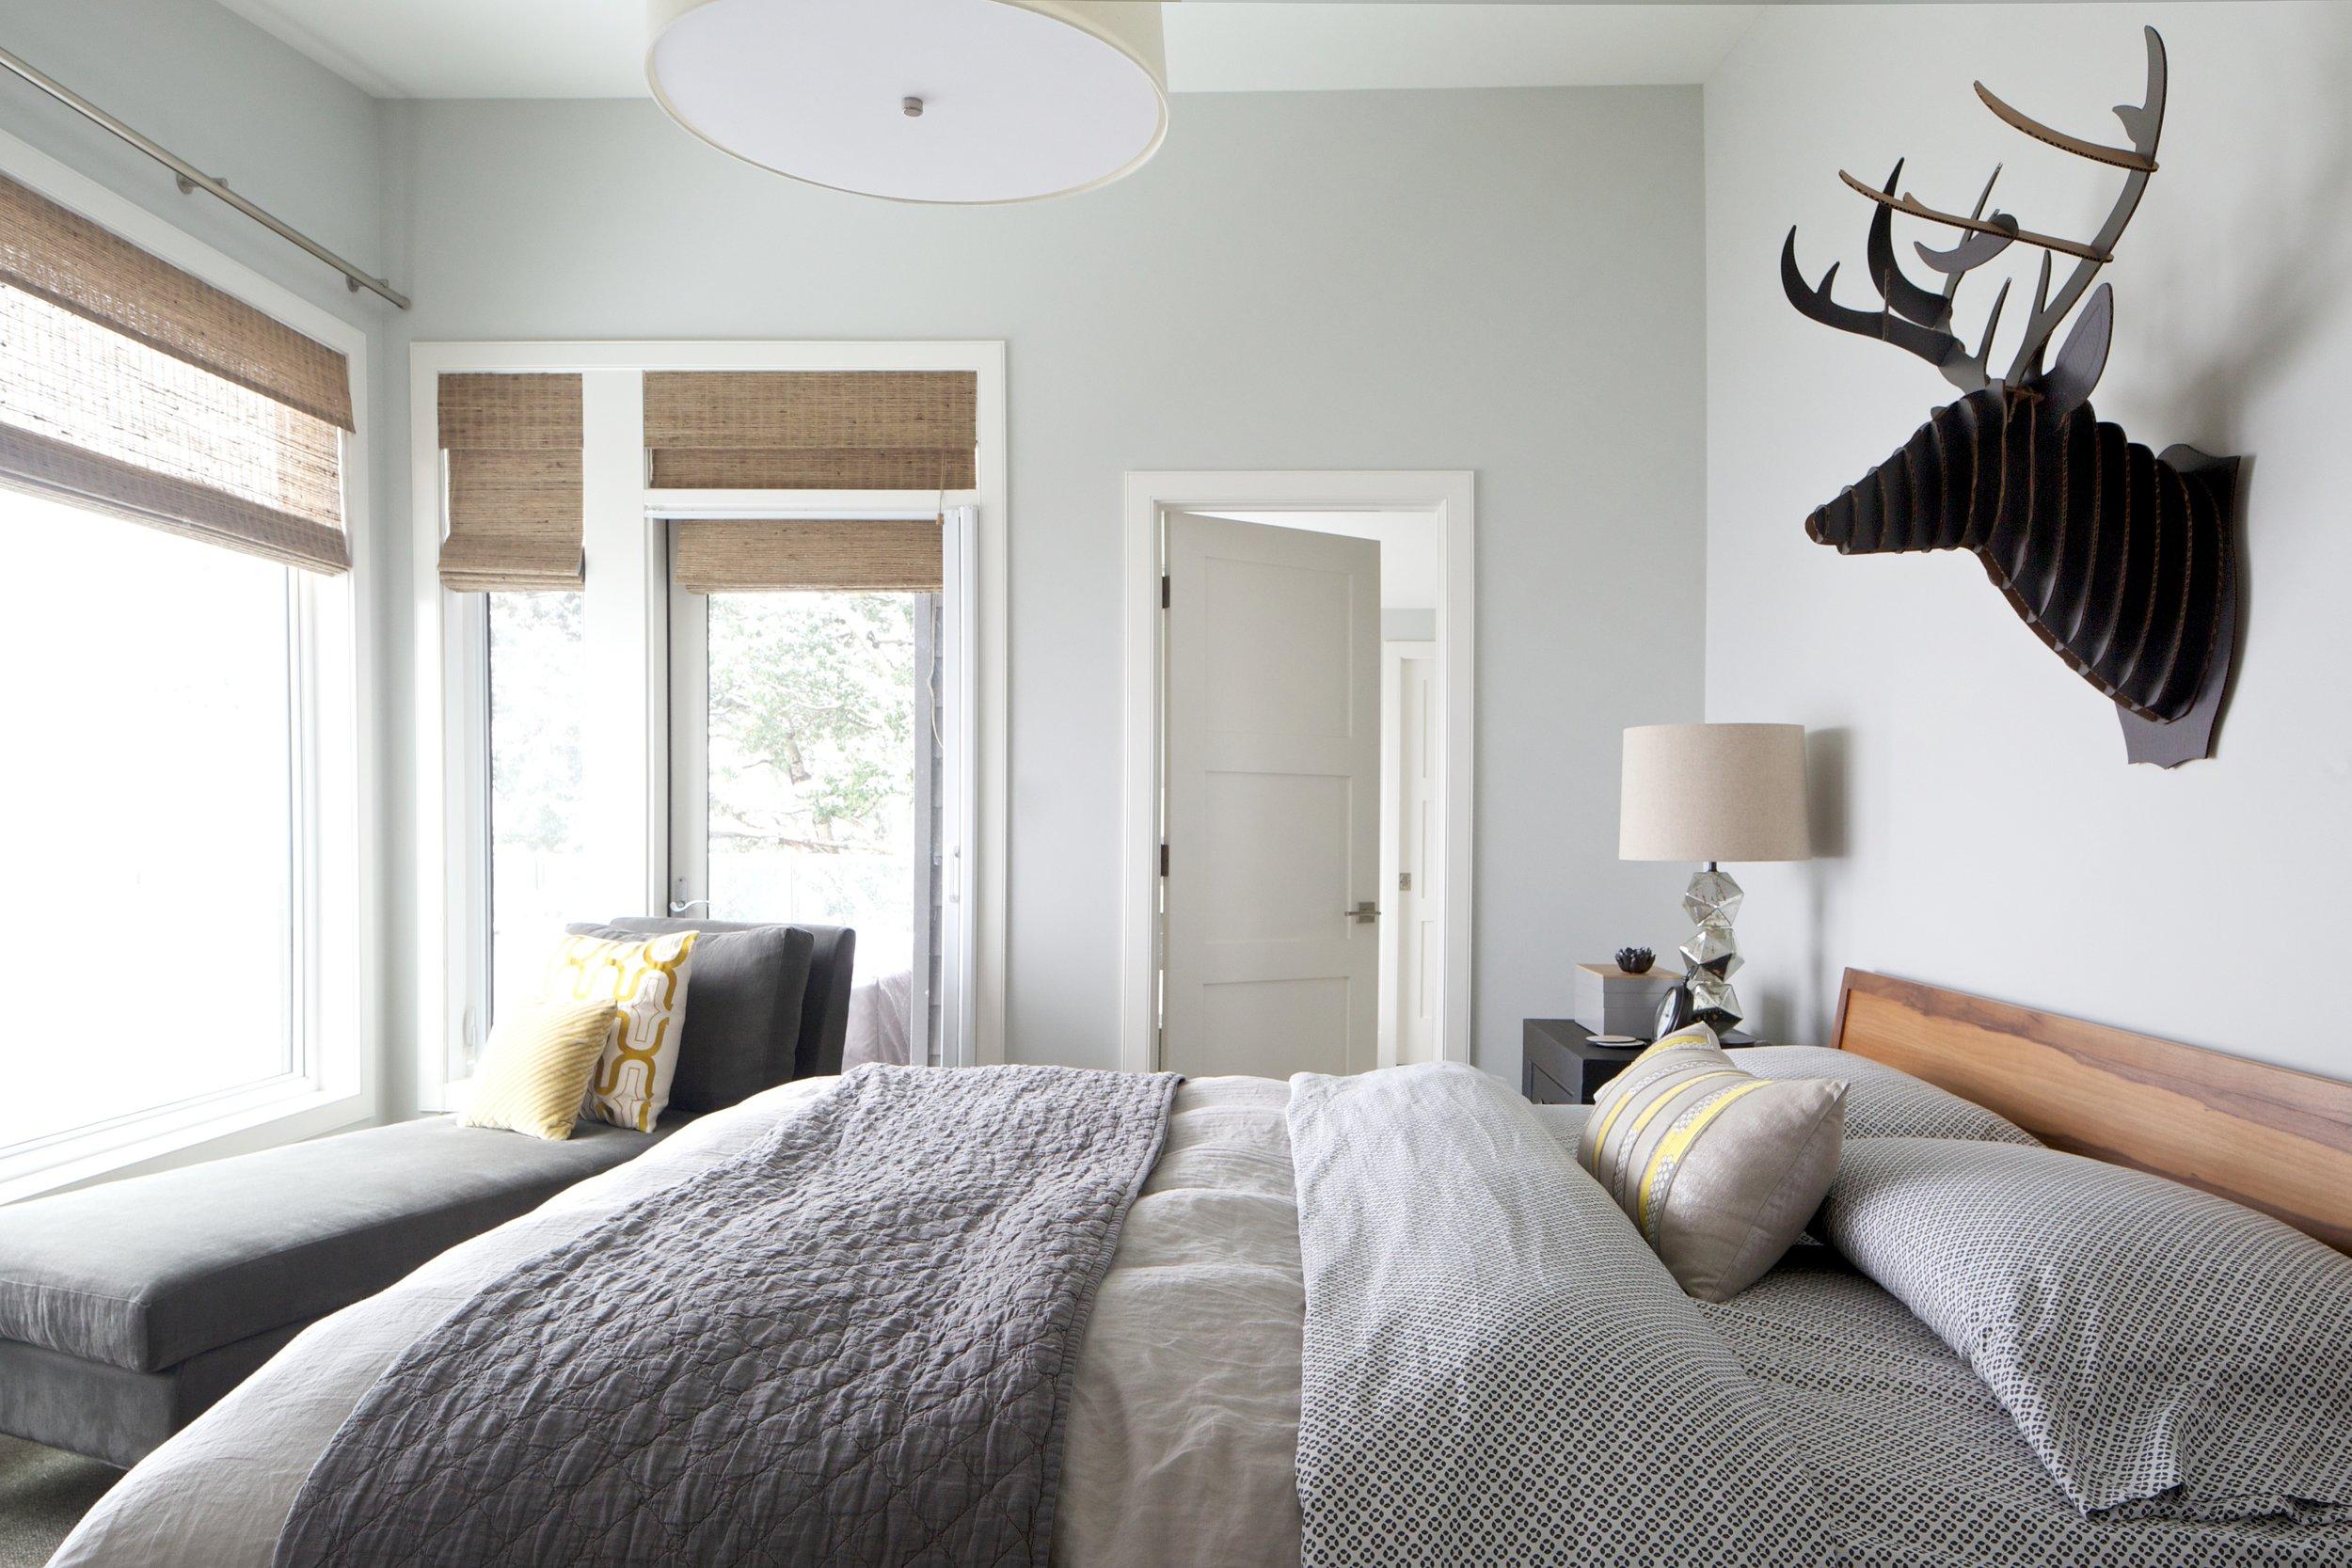 Sylvan Lake Cottage, Master Bedroom, Nyla Free Designs Inc., Phil Crozier Photography